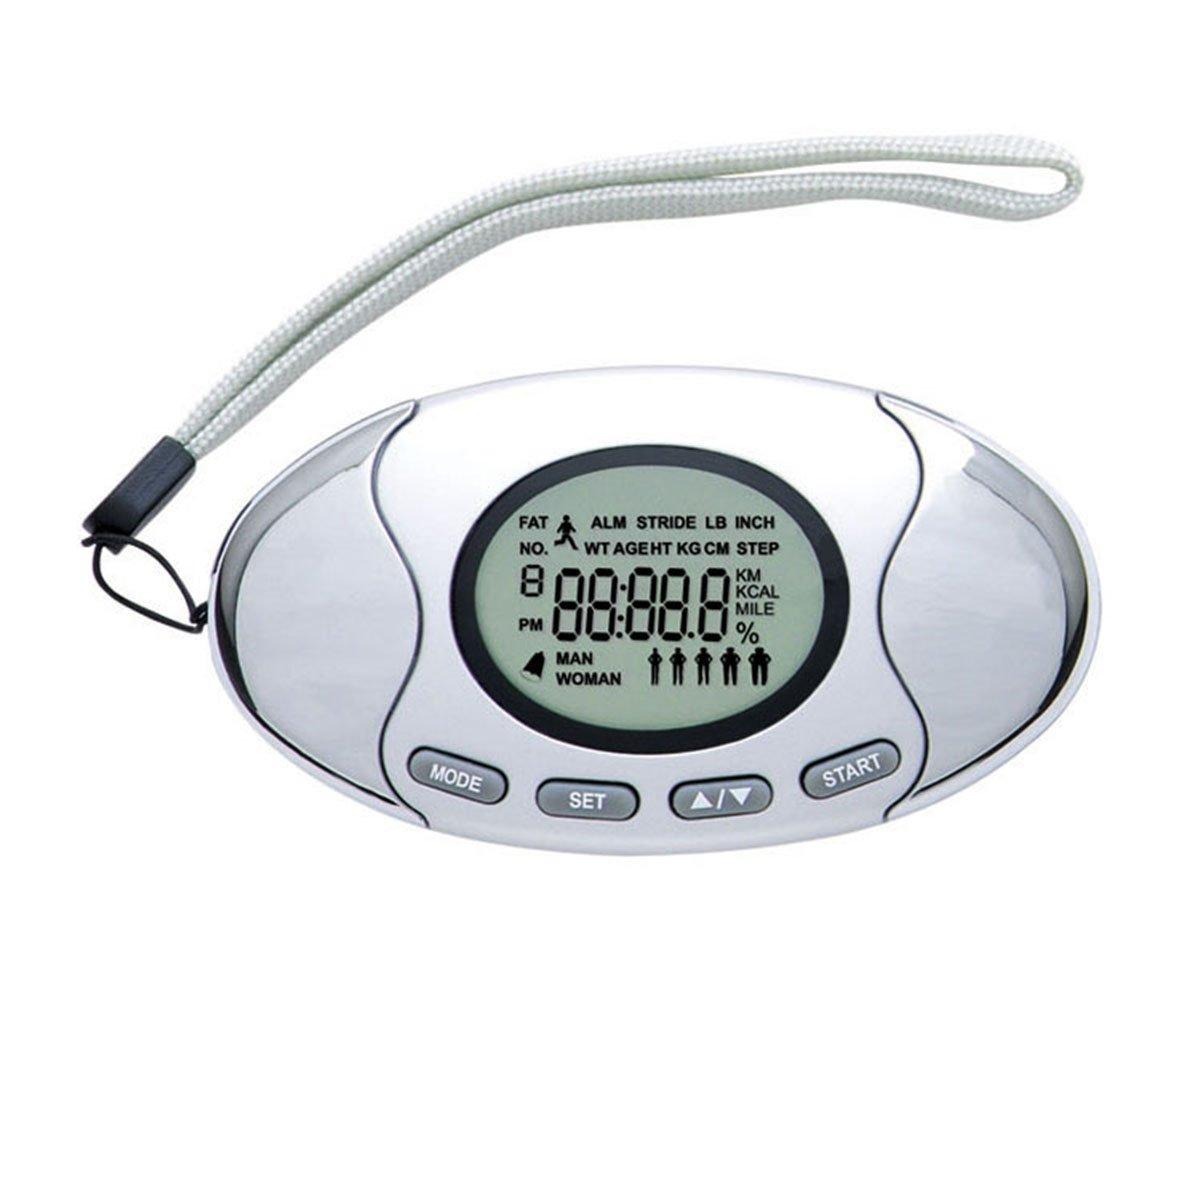 WINOMOデジタル歩数計ステップカウンタランニング歩数計ウォーキング距離カロリーカウンターwithストラップ   B074TFDL9Y